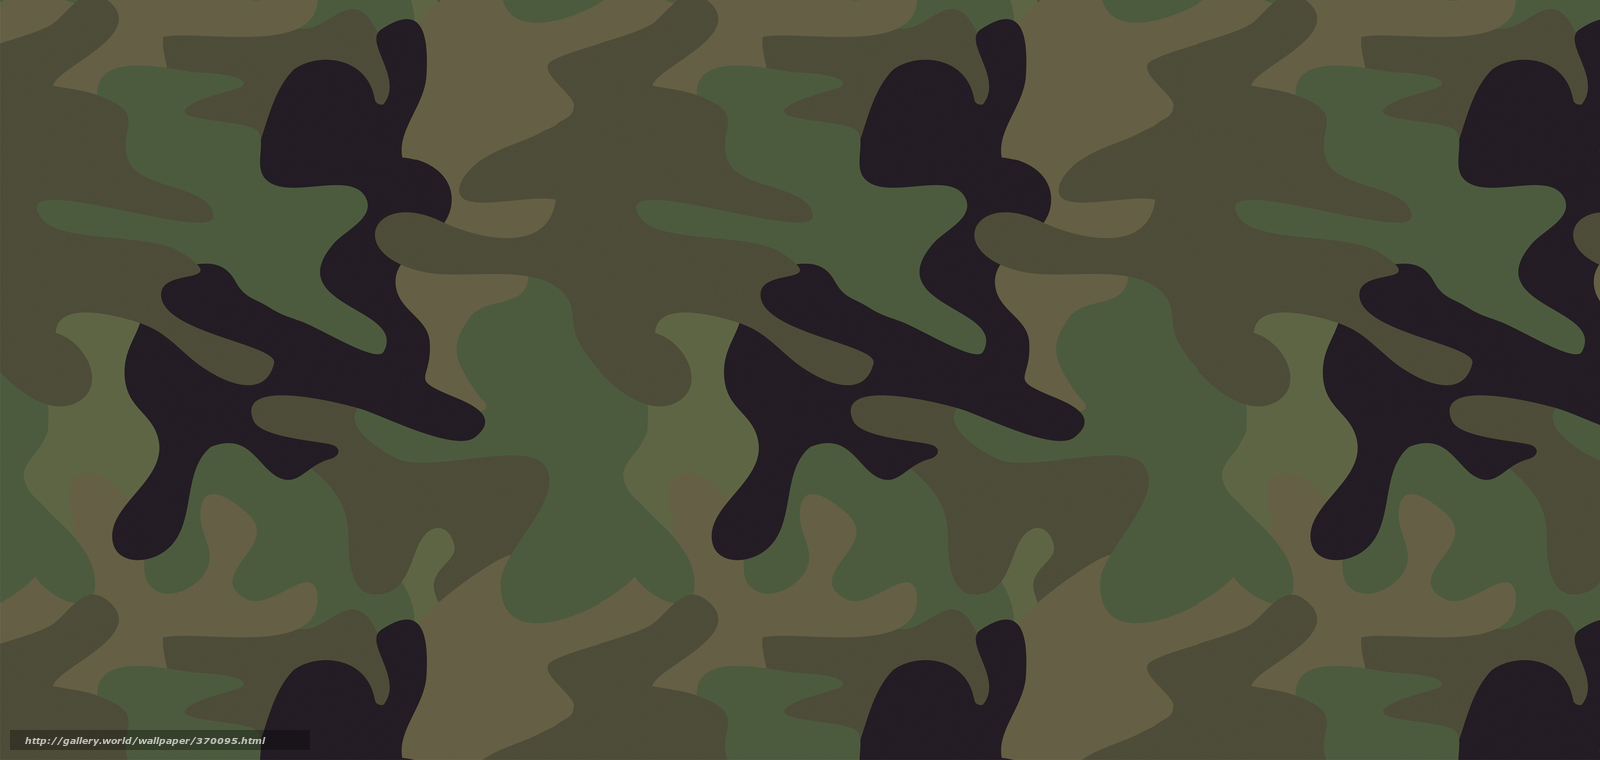 tlcharger fond d 39 ecran kaki texture camouflage fonds d